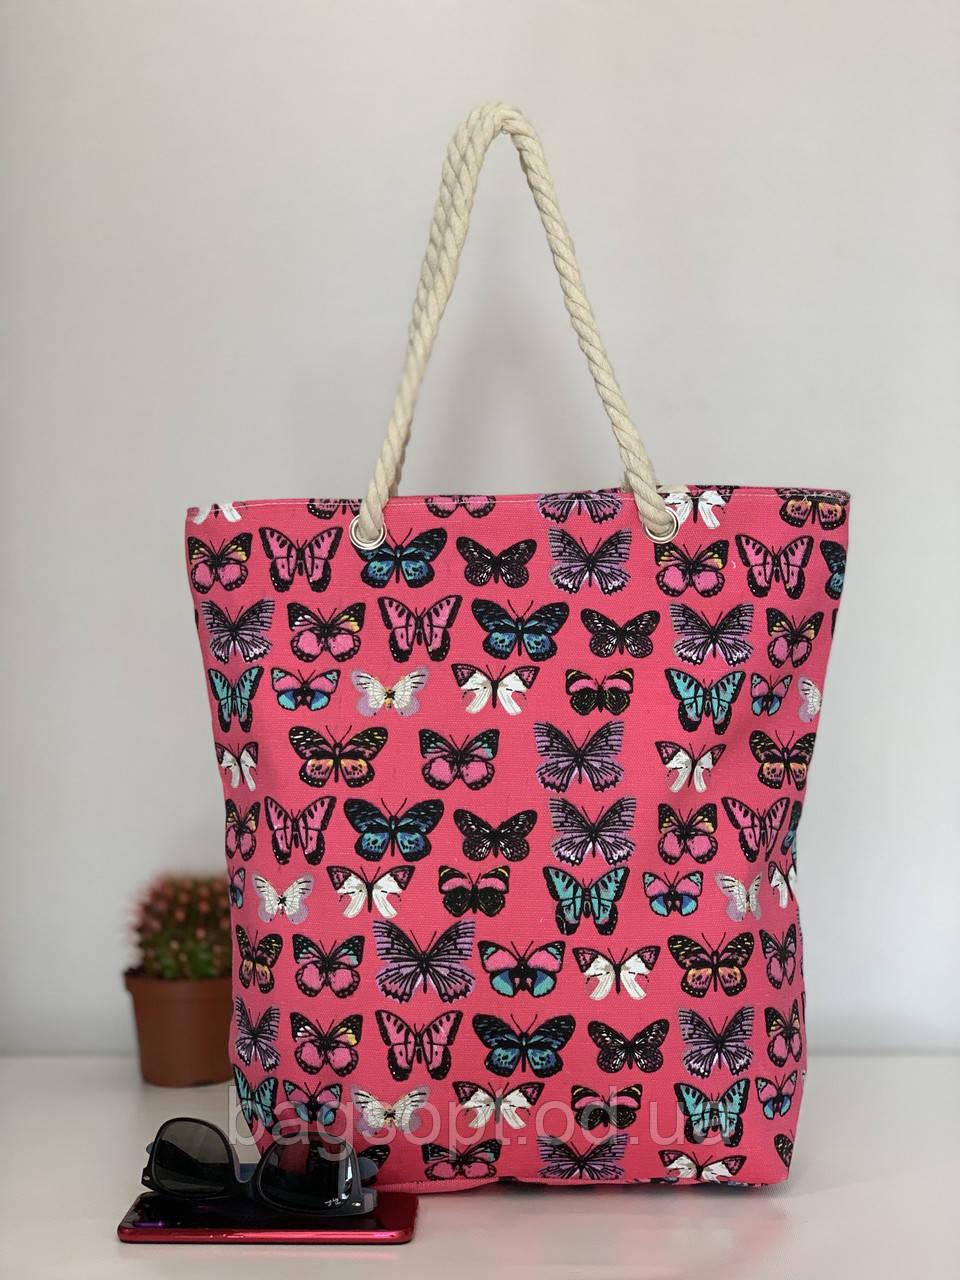 Яркая пляжная сумка шоппер тканевая женская с бабочками